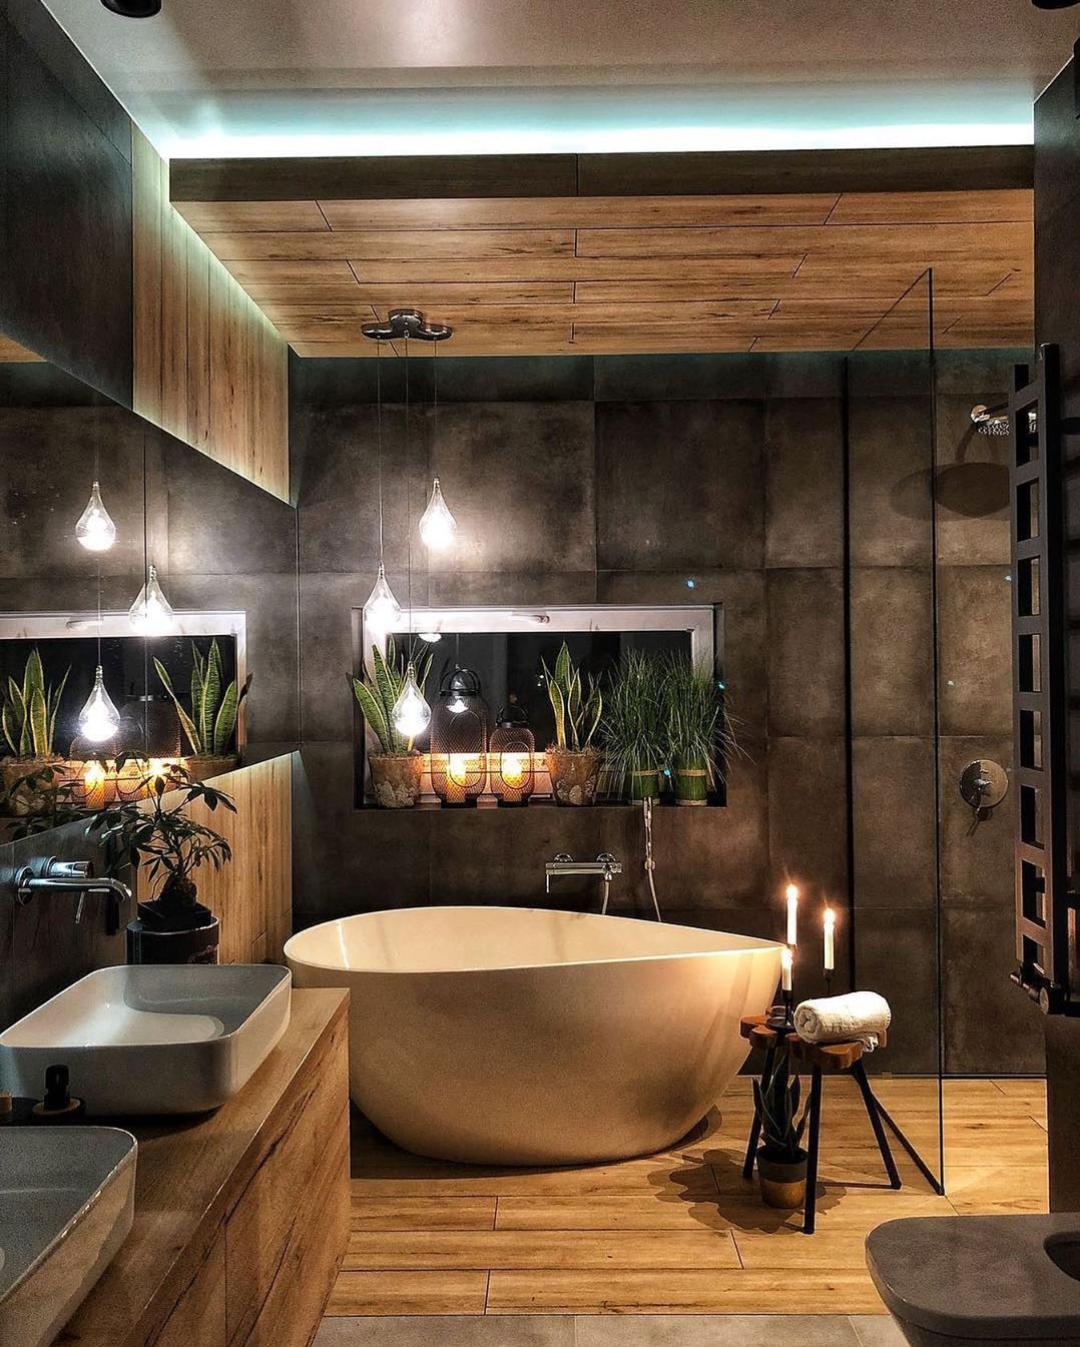 custom made modular furniture. bathroom decor, organic interior styles. lakkadworks